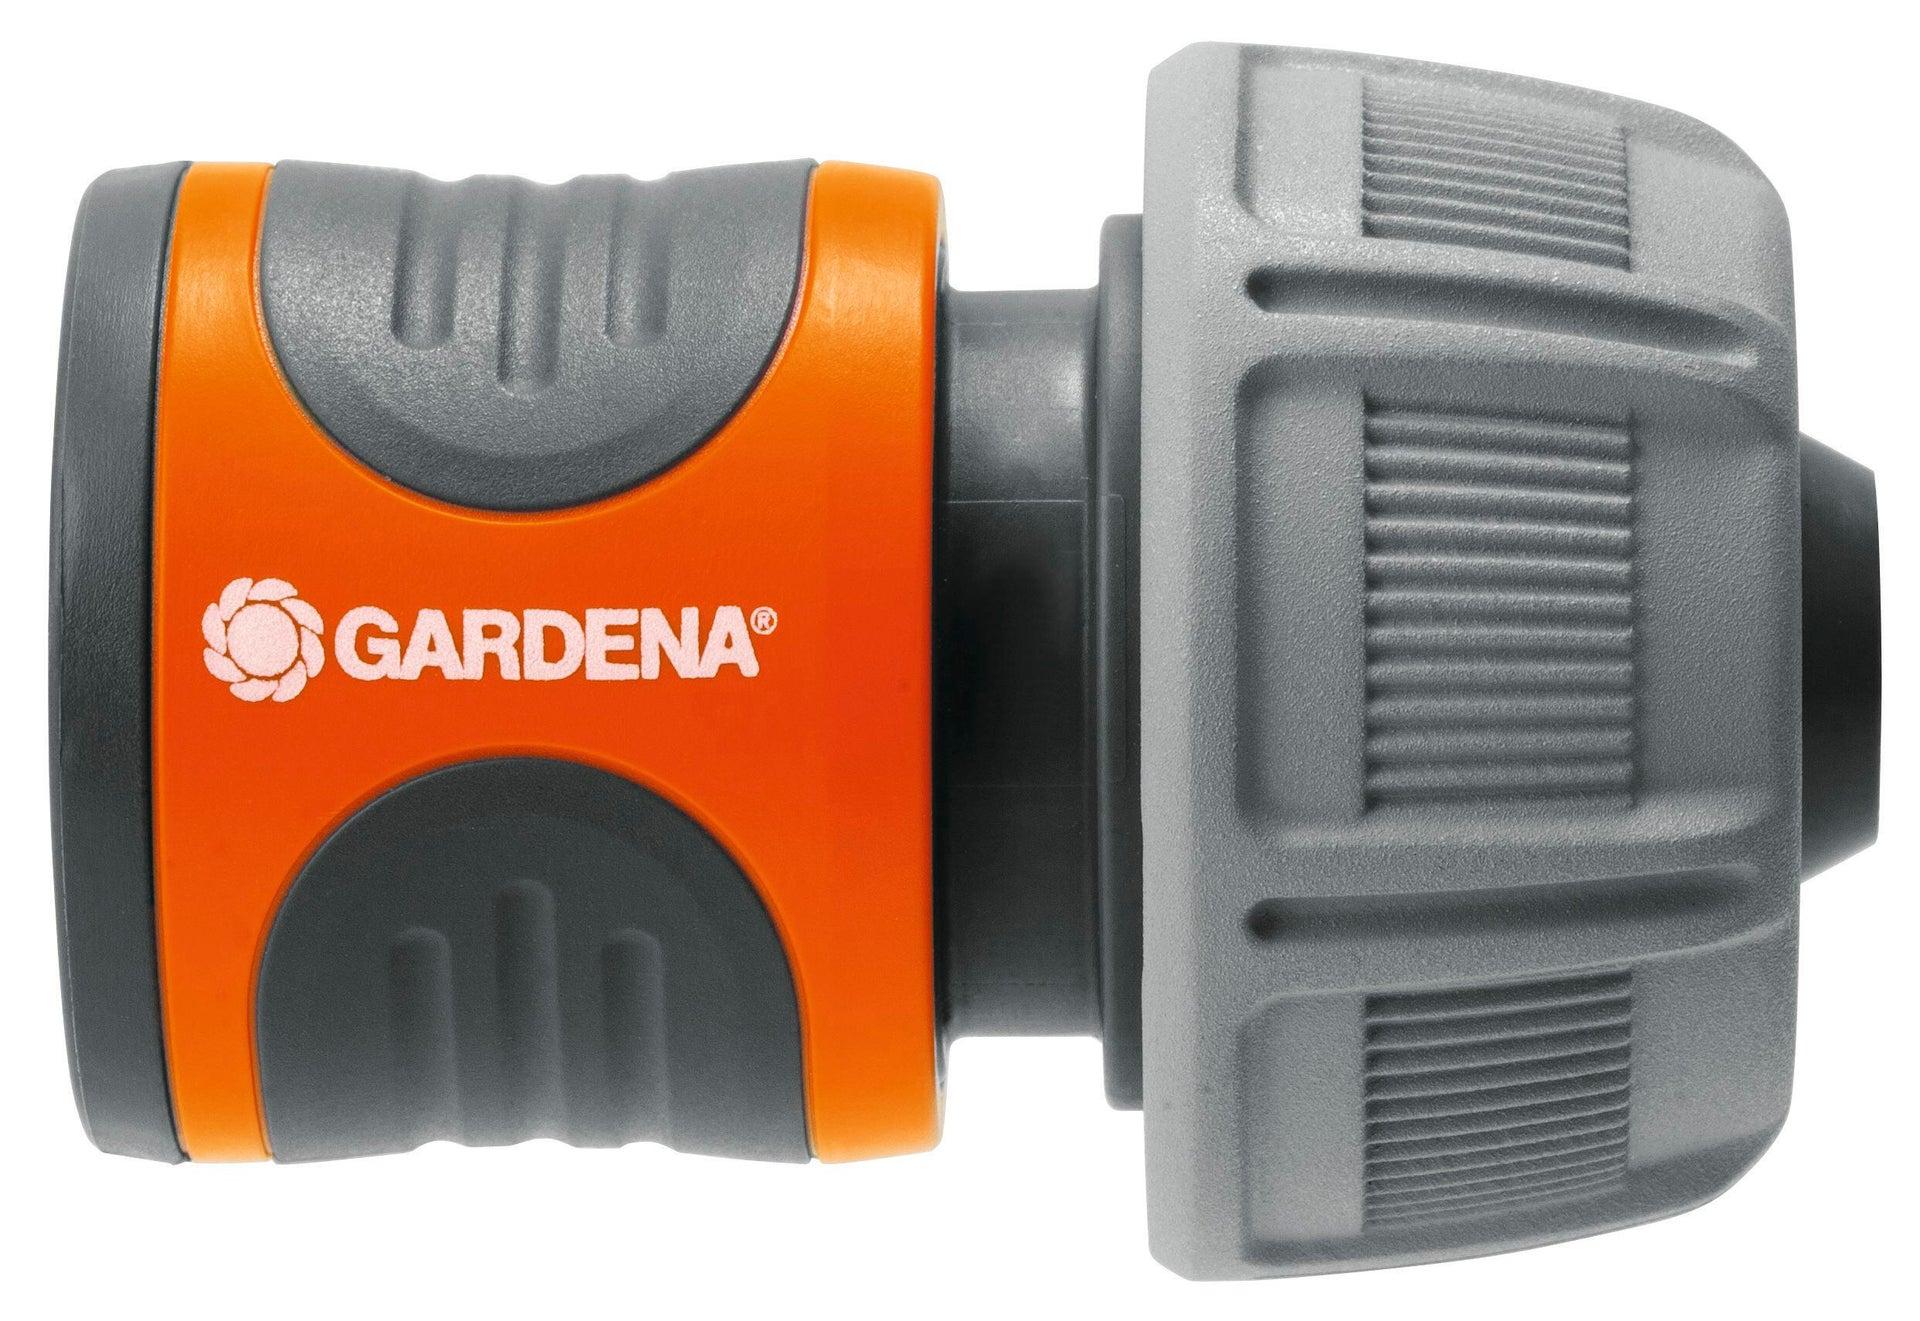 Connettore rapido femmina GARDENA 19 mm - 2